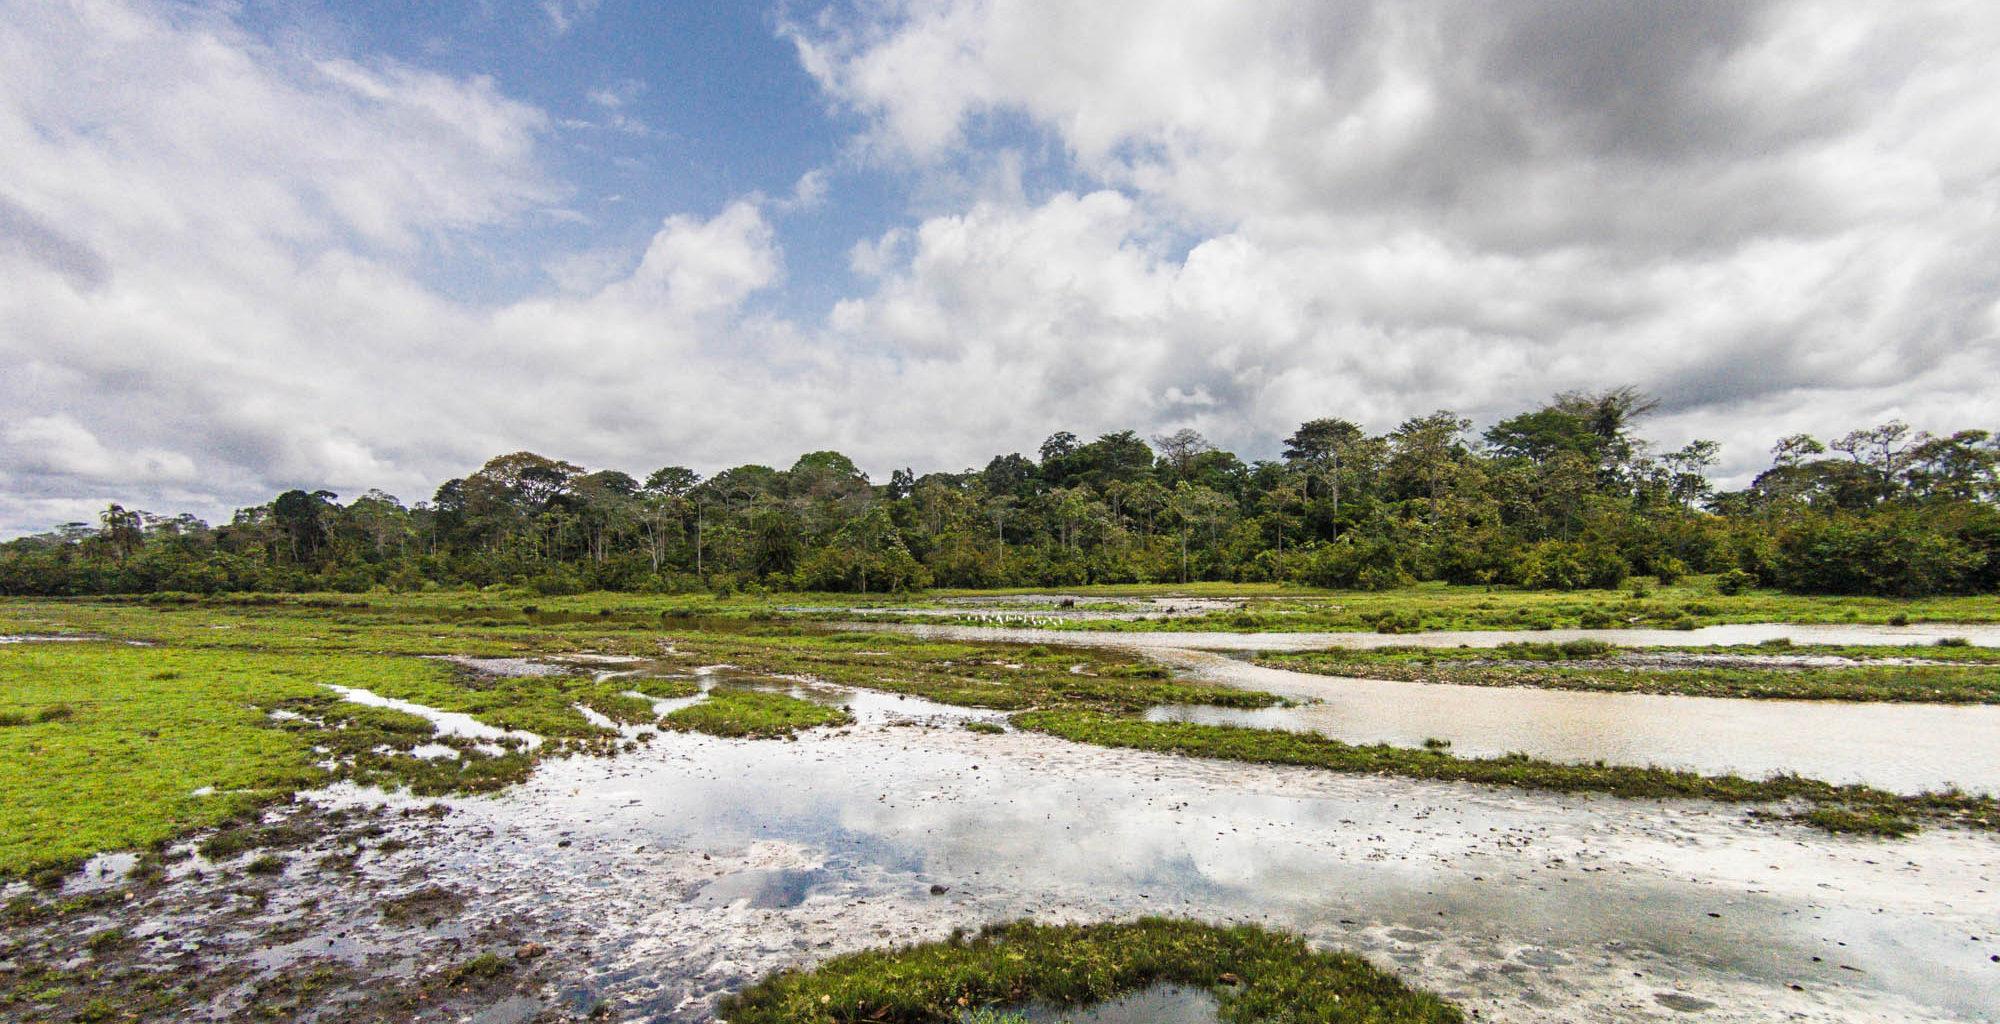 Republic-of-Congo-Odzala-Landscape